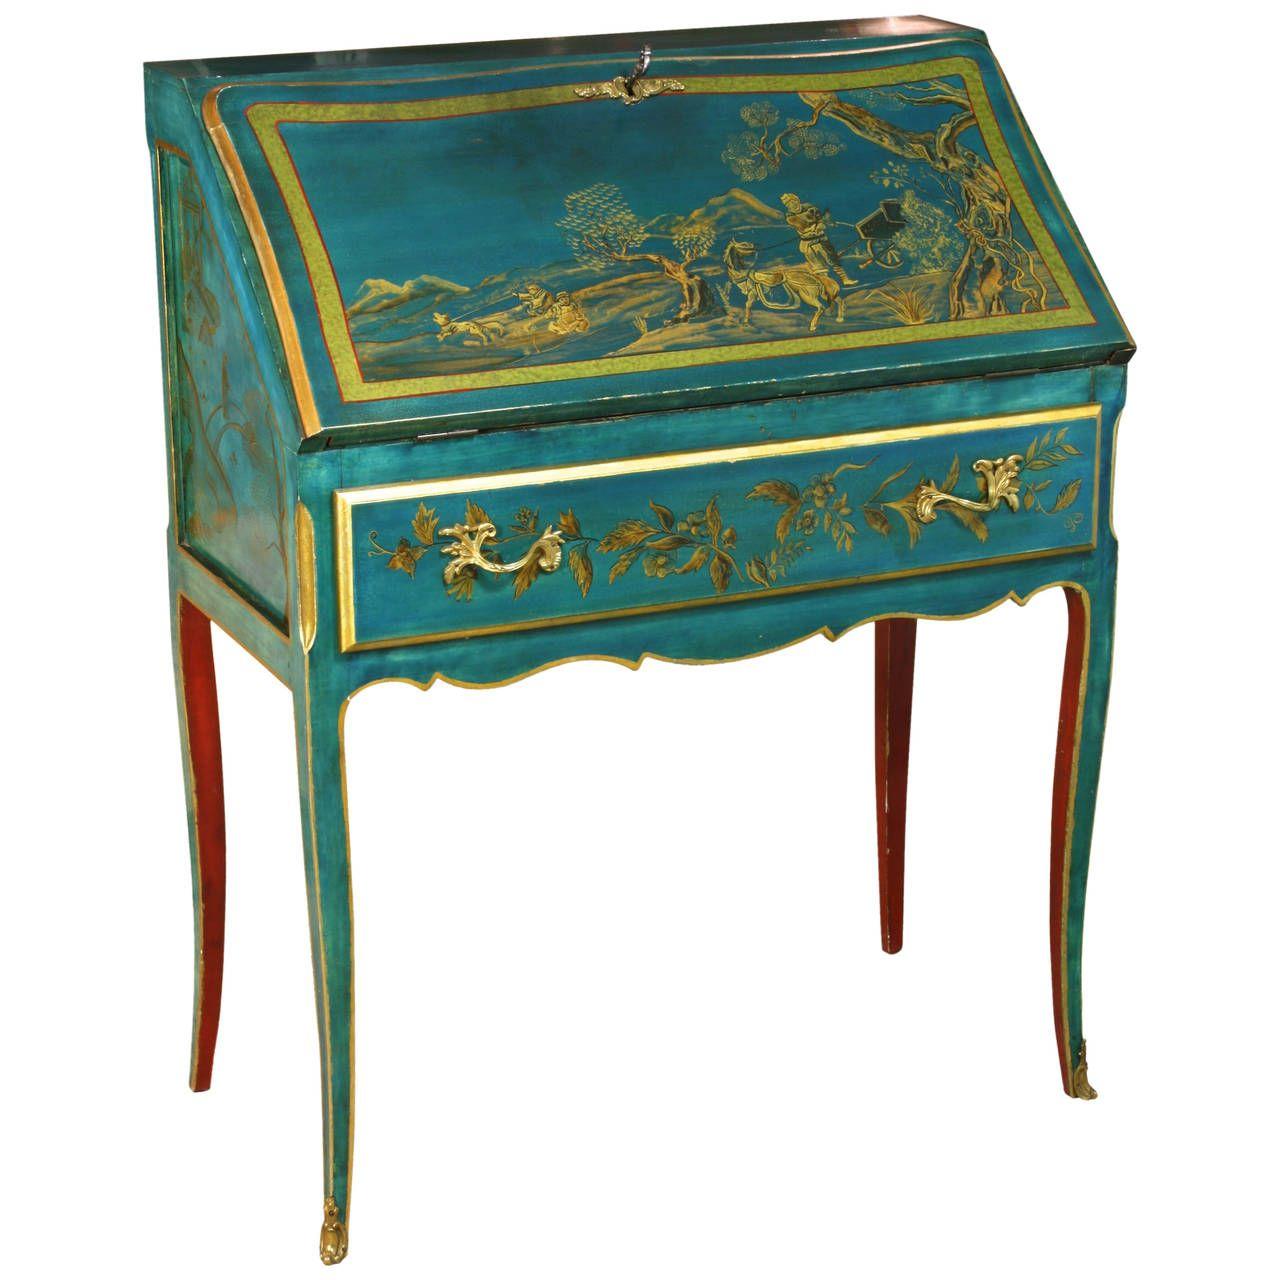 Louis XV Style Chinoiserie Slant-Top Desk   1stdibs.com - Louis XV Style Chinoiserie Slant-Top Desk The Future's Callin' My